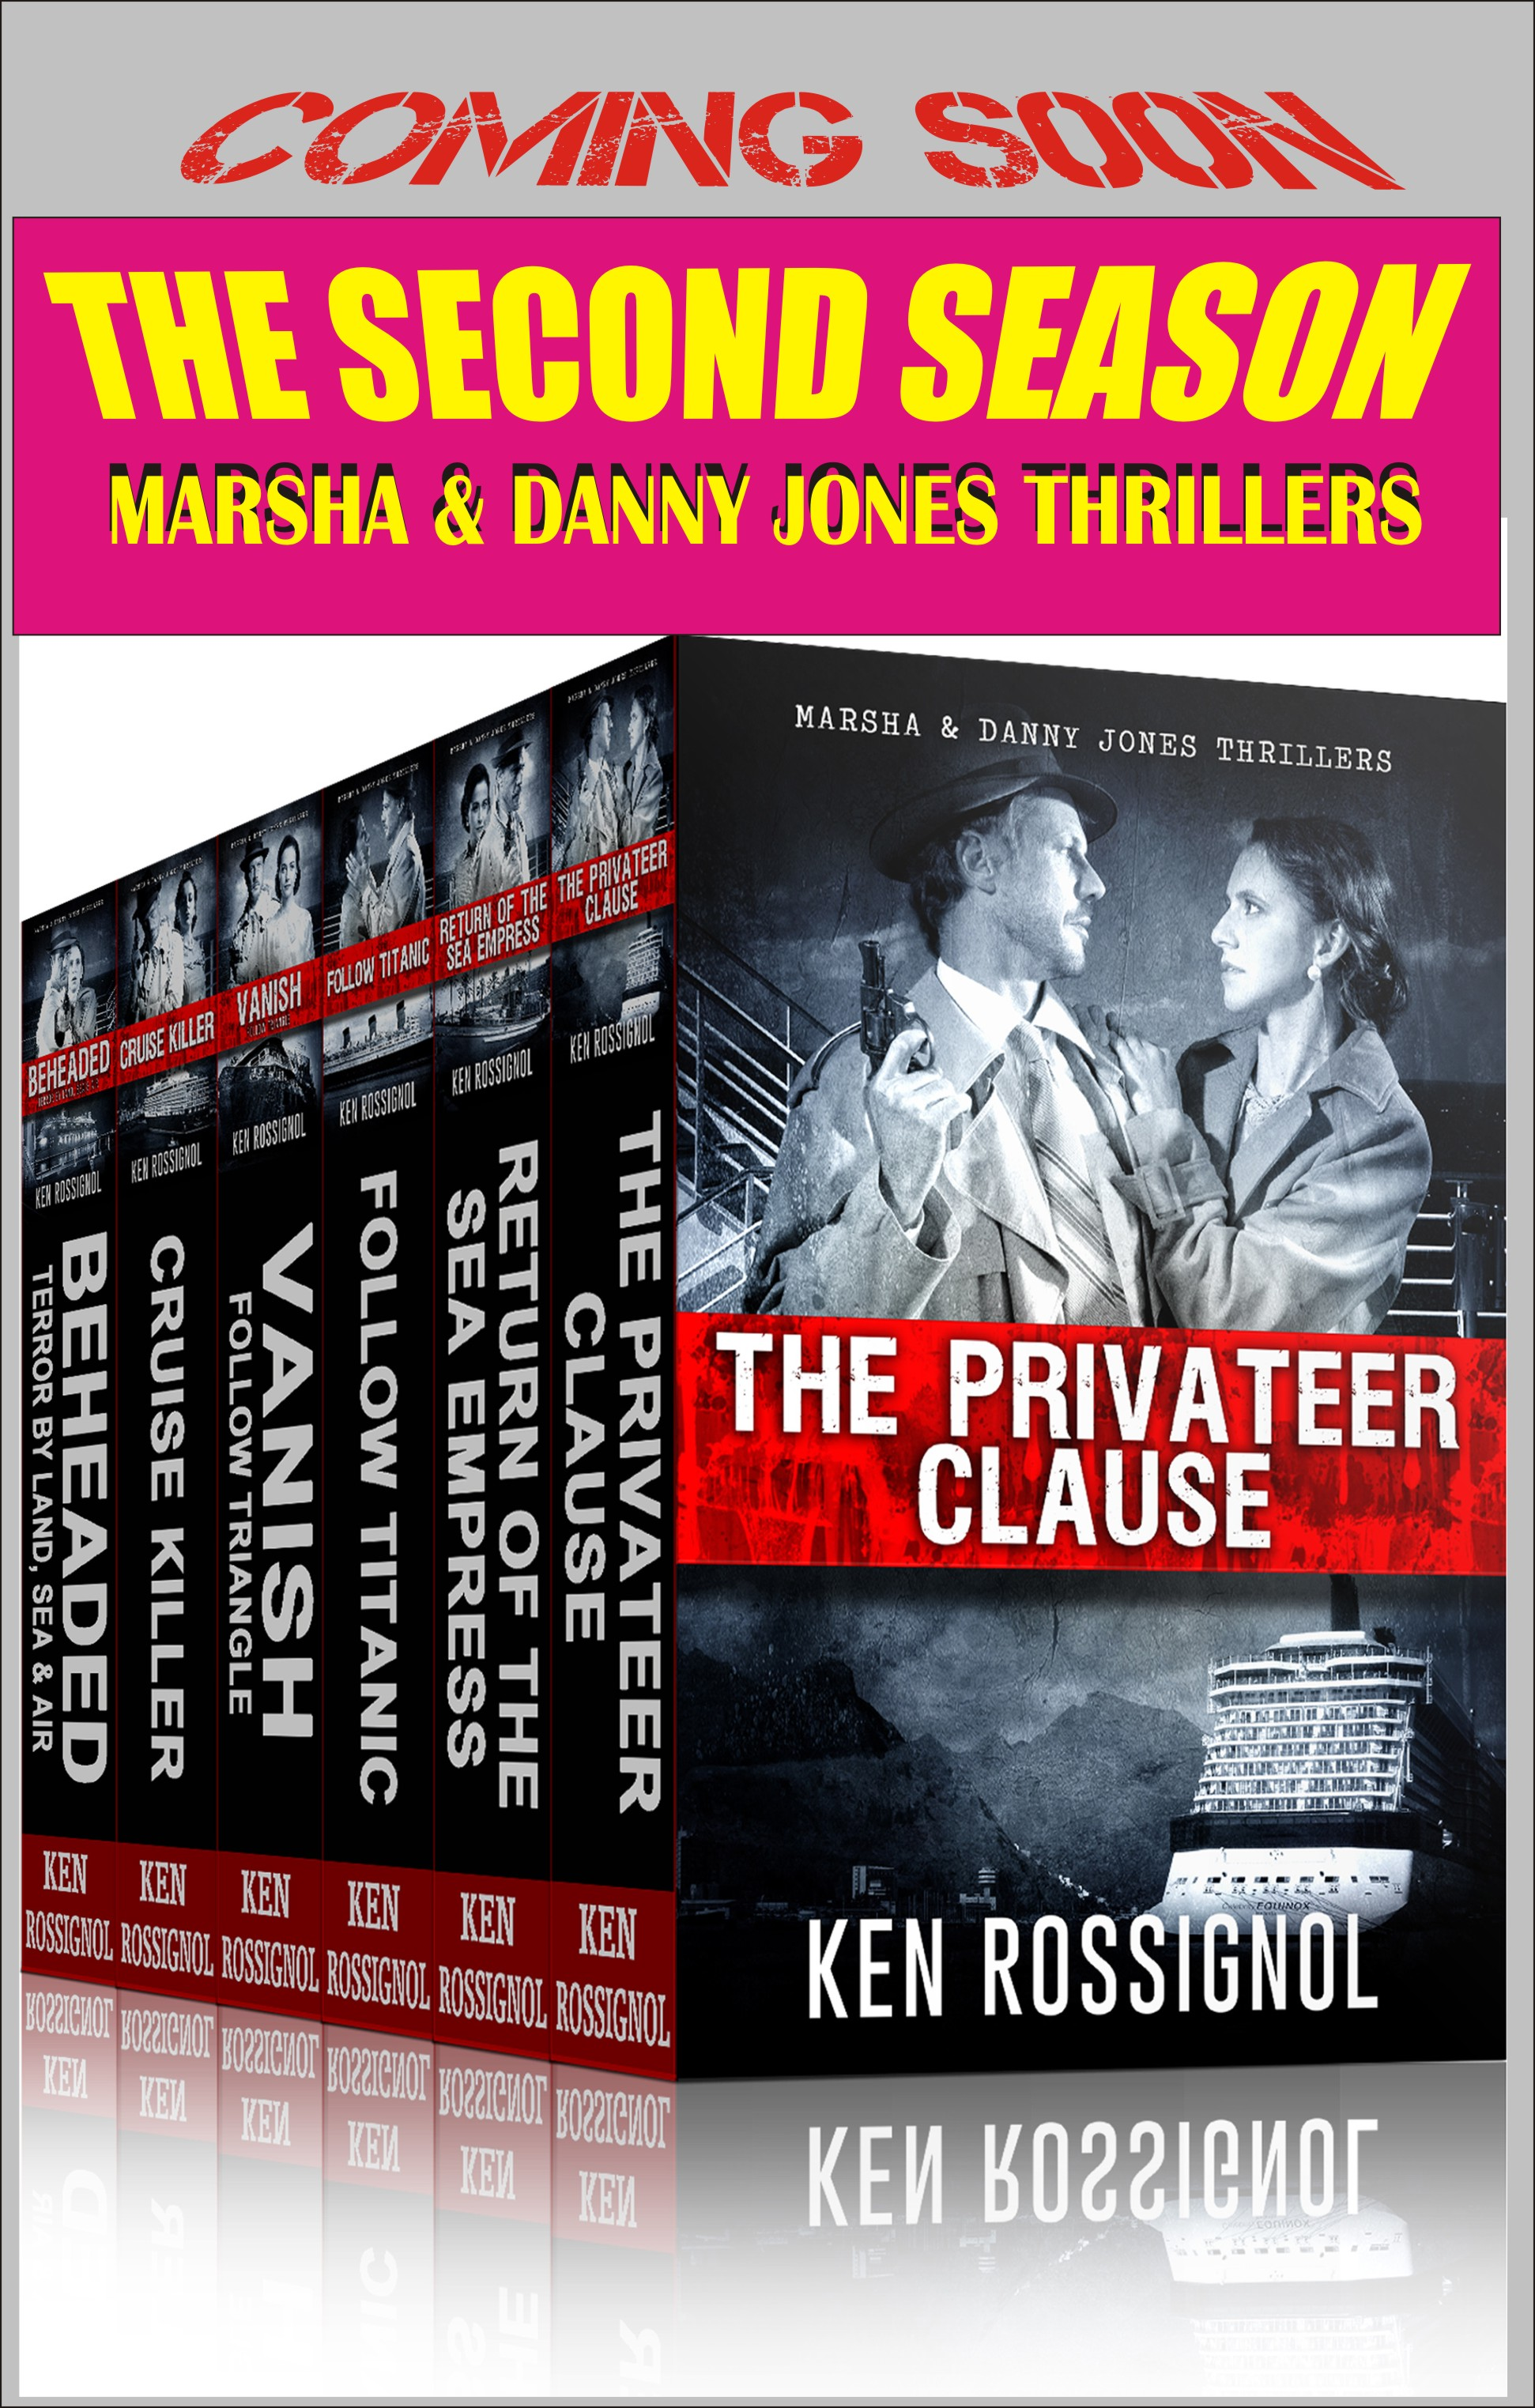 Second Season of the Marsha & Danny Jones Thrillers – The Preamble